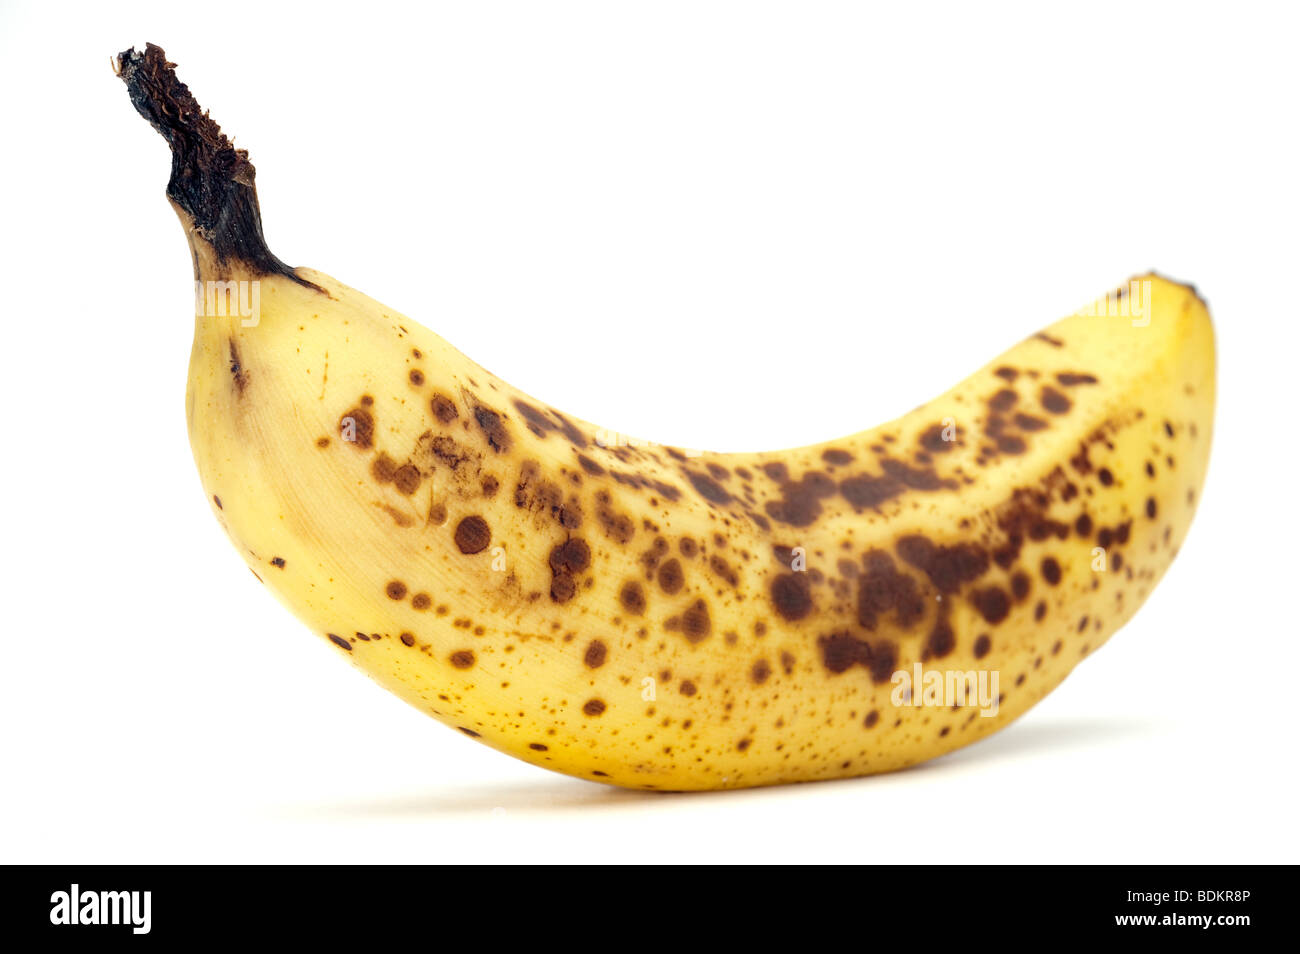 'Over ripe' speckled banana - Stock Image